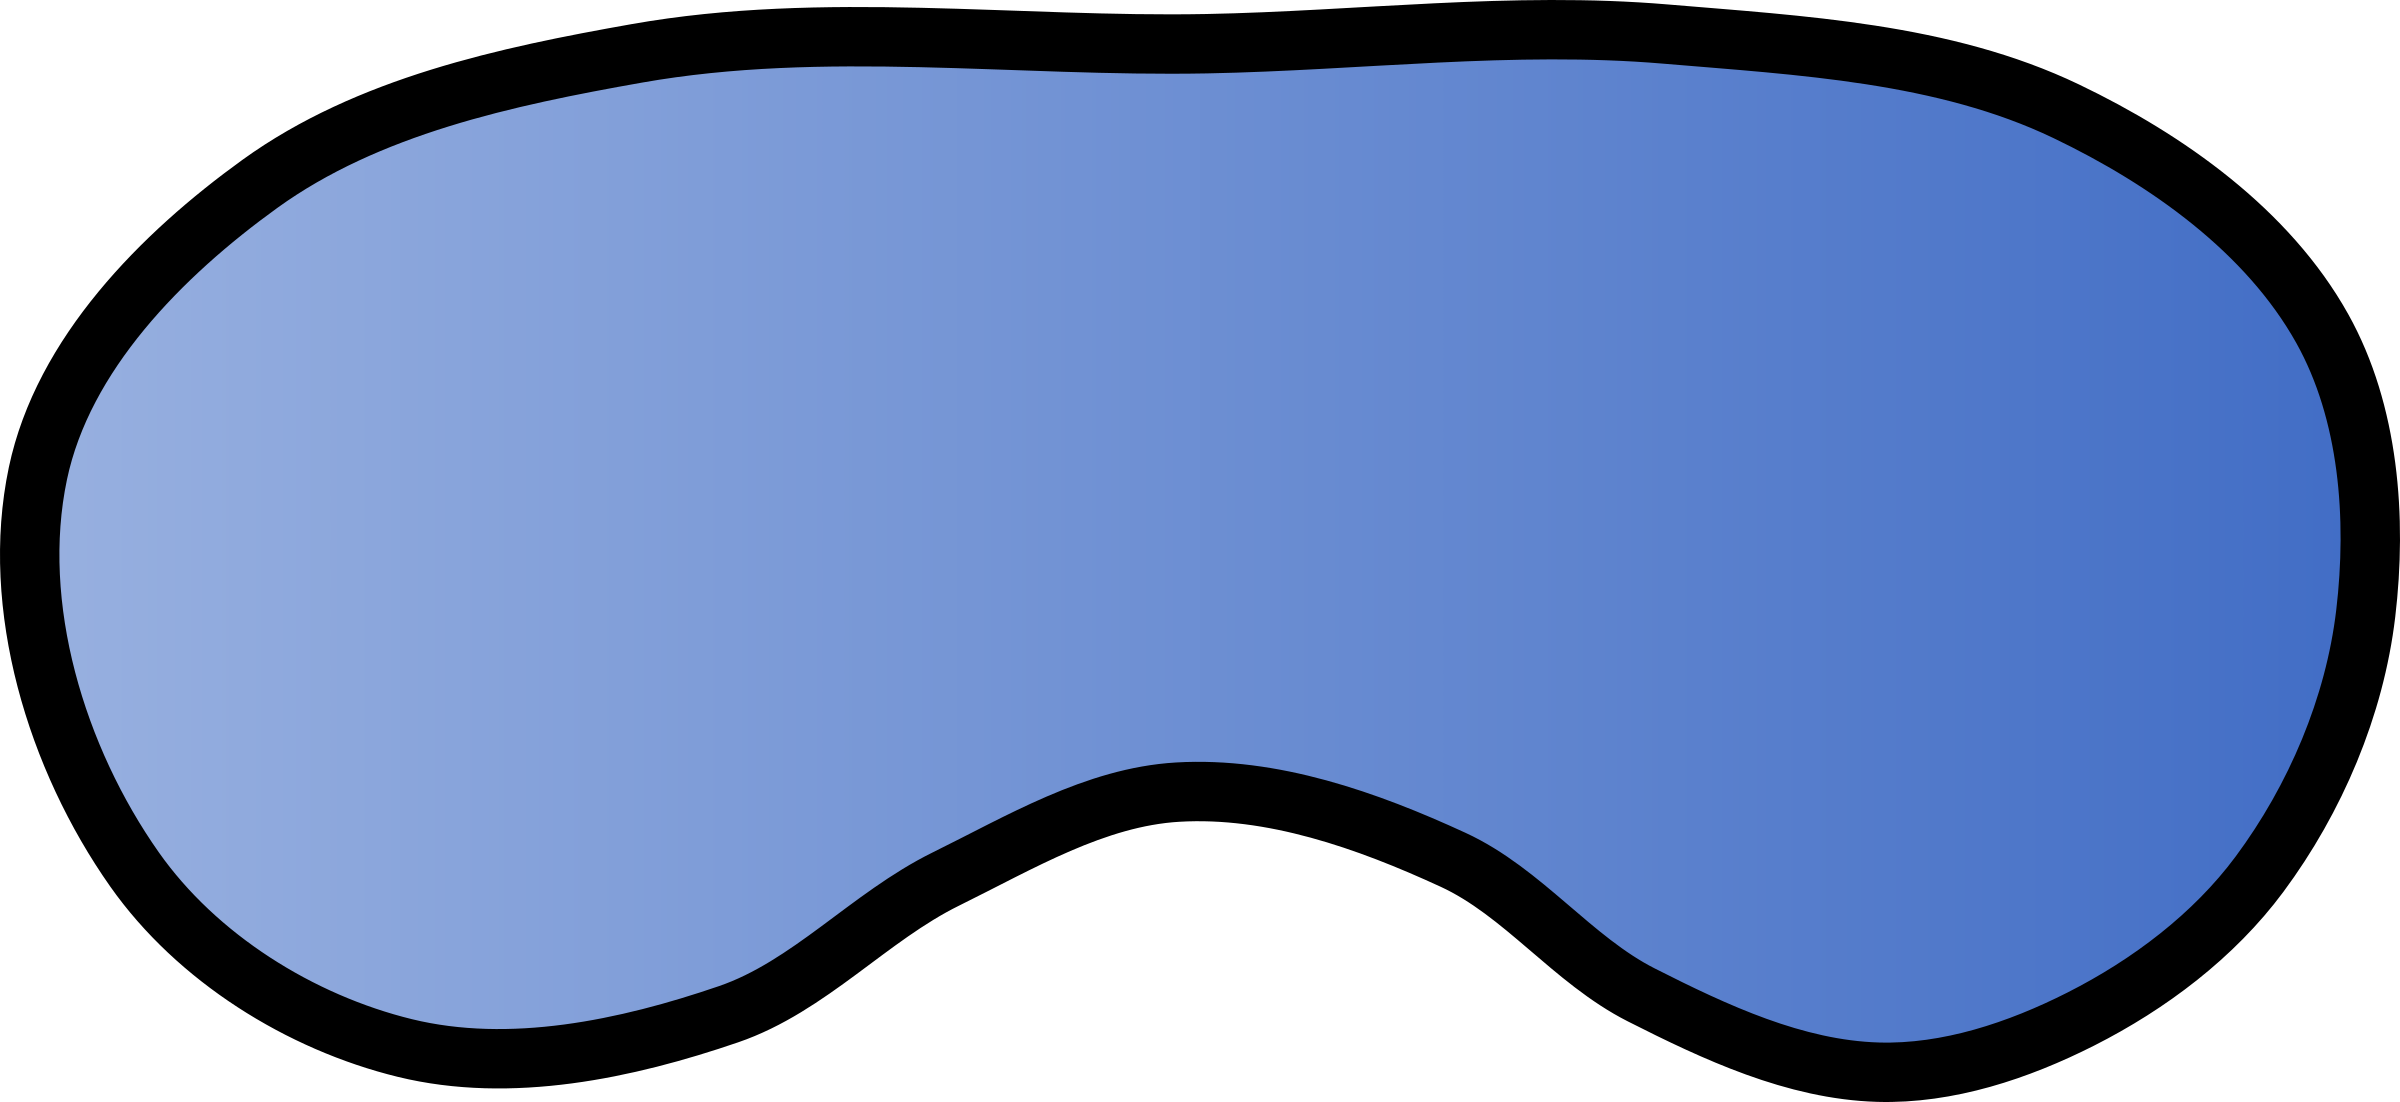 2400x1102 Mask Clipart Eye Mask